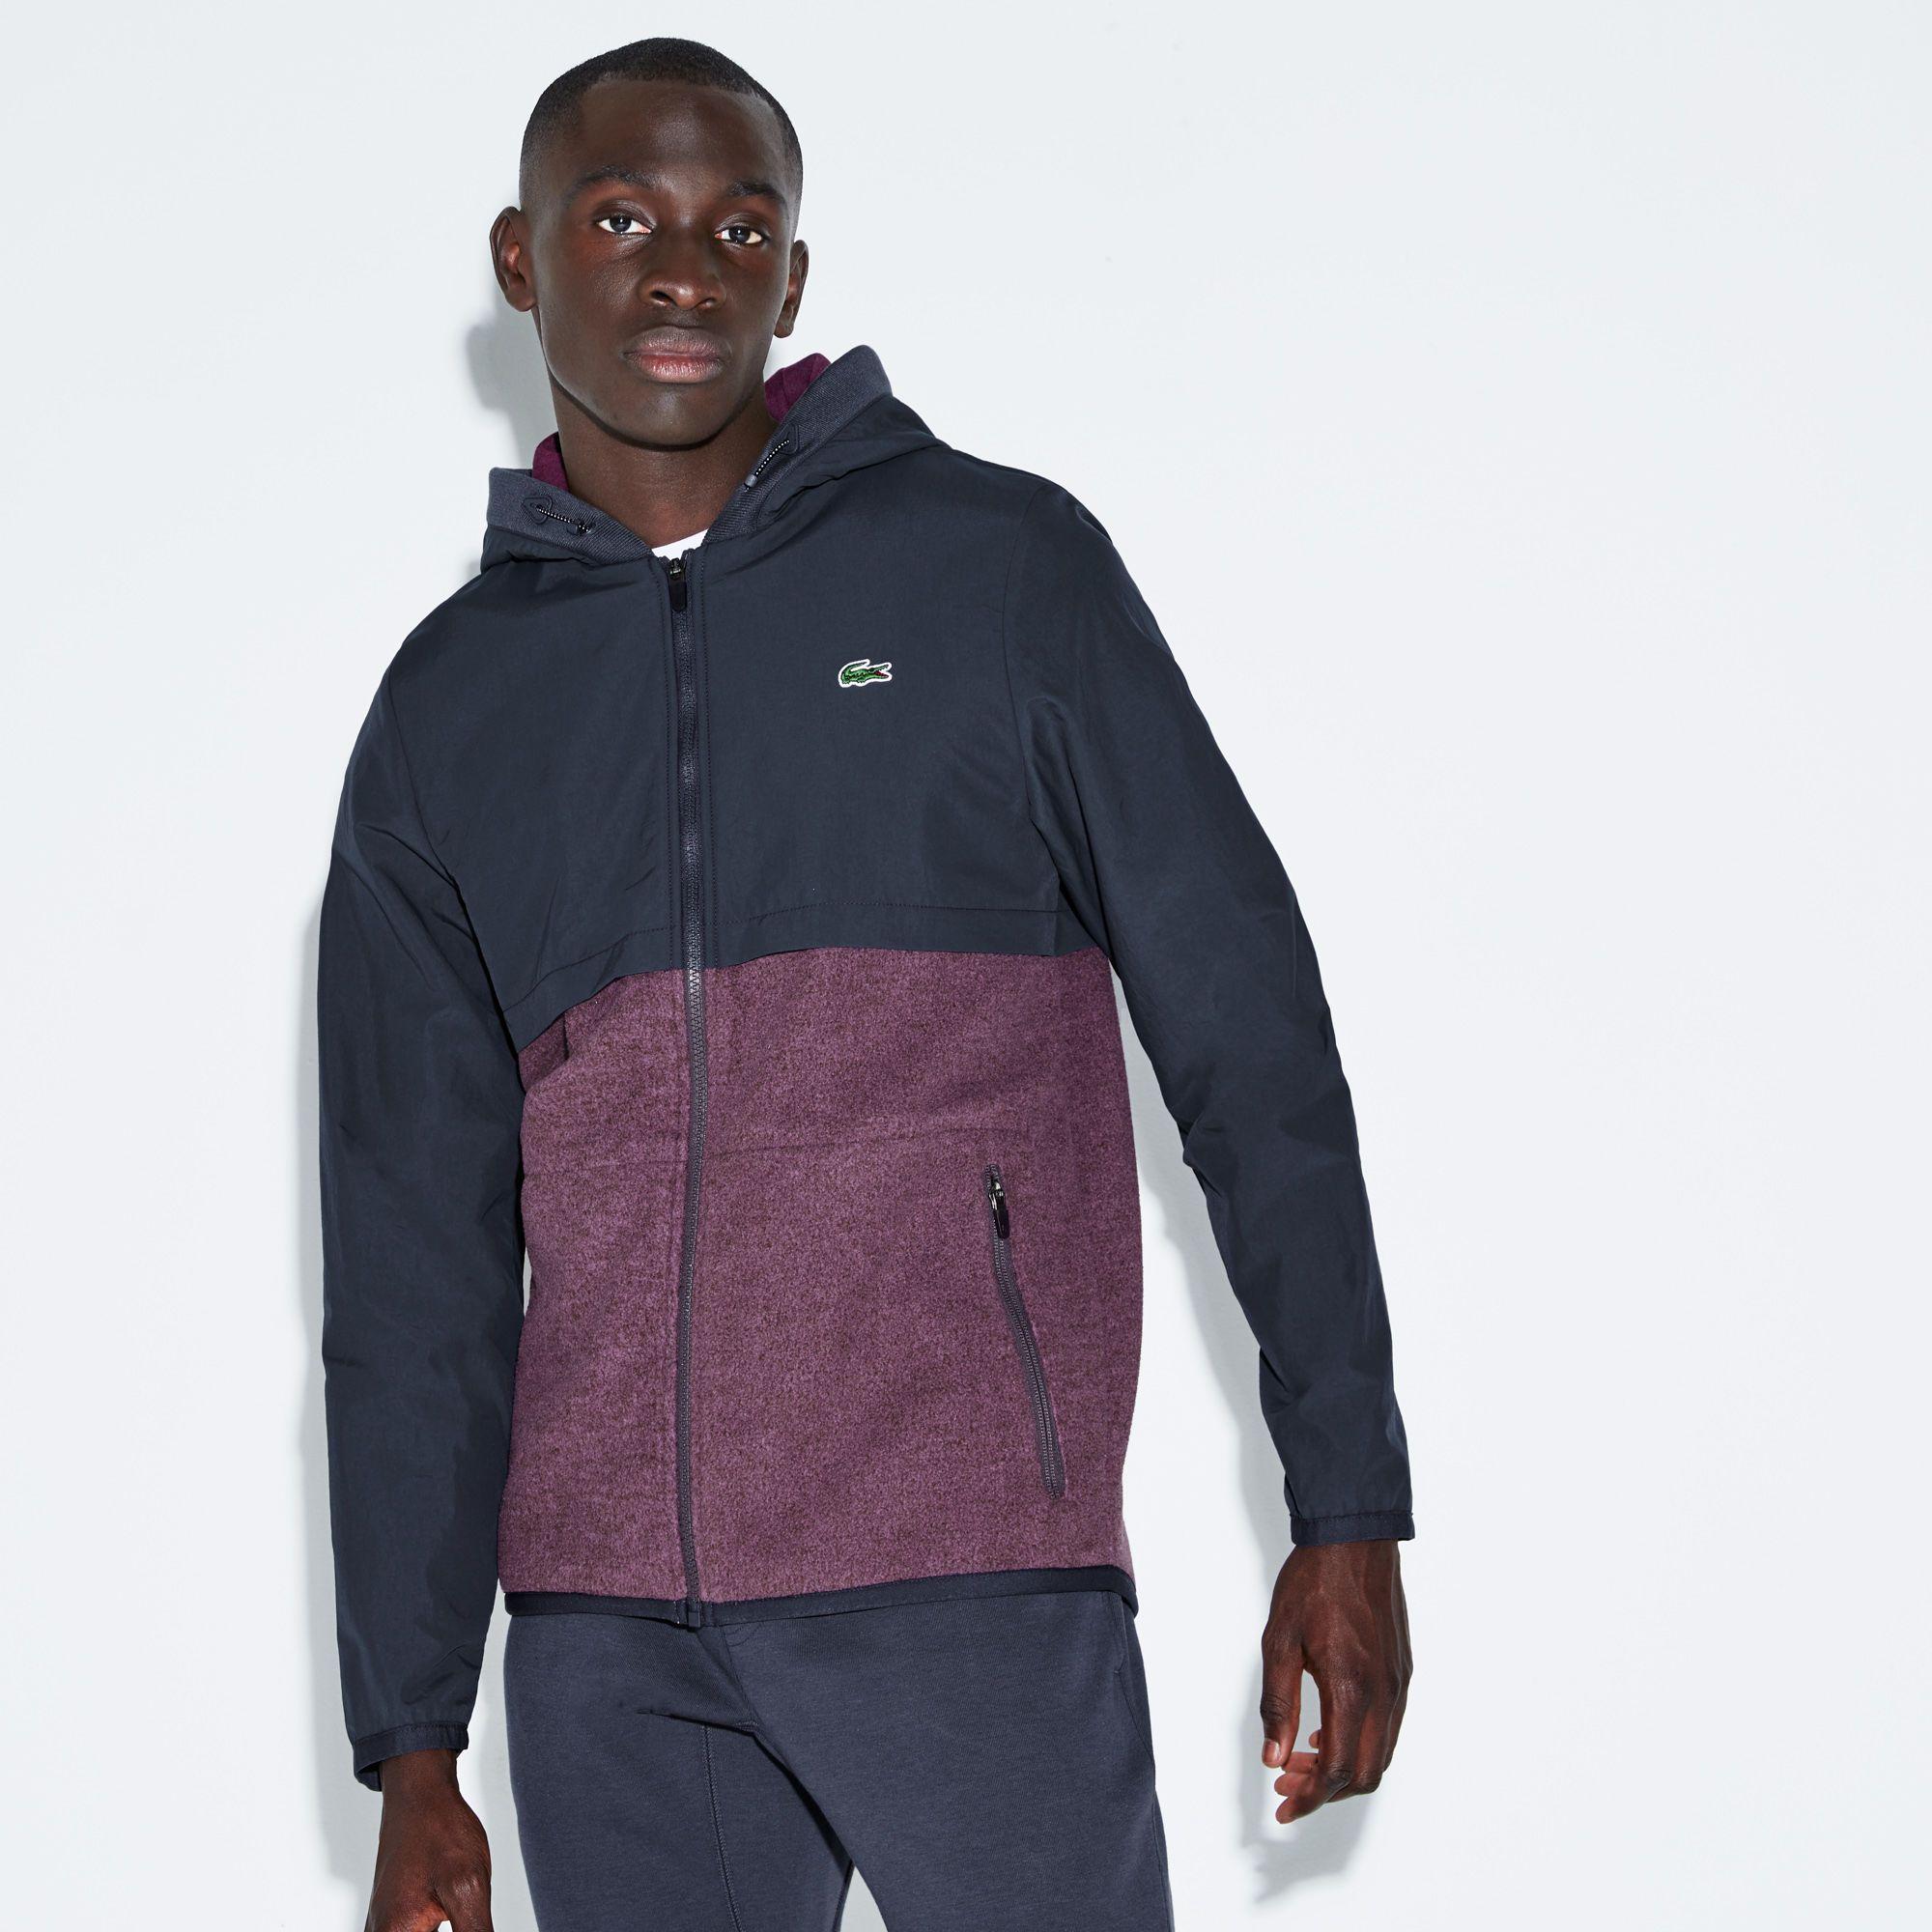 NEW Lacoste Men's Sport Hooded Zippered Water Resistant Tennis Rain Jacket